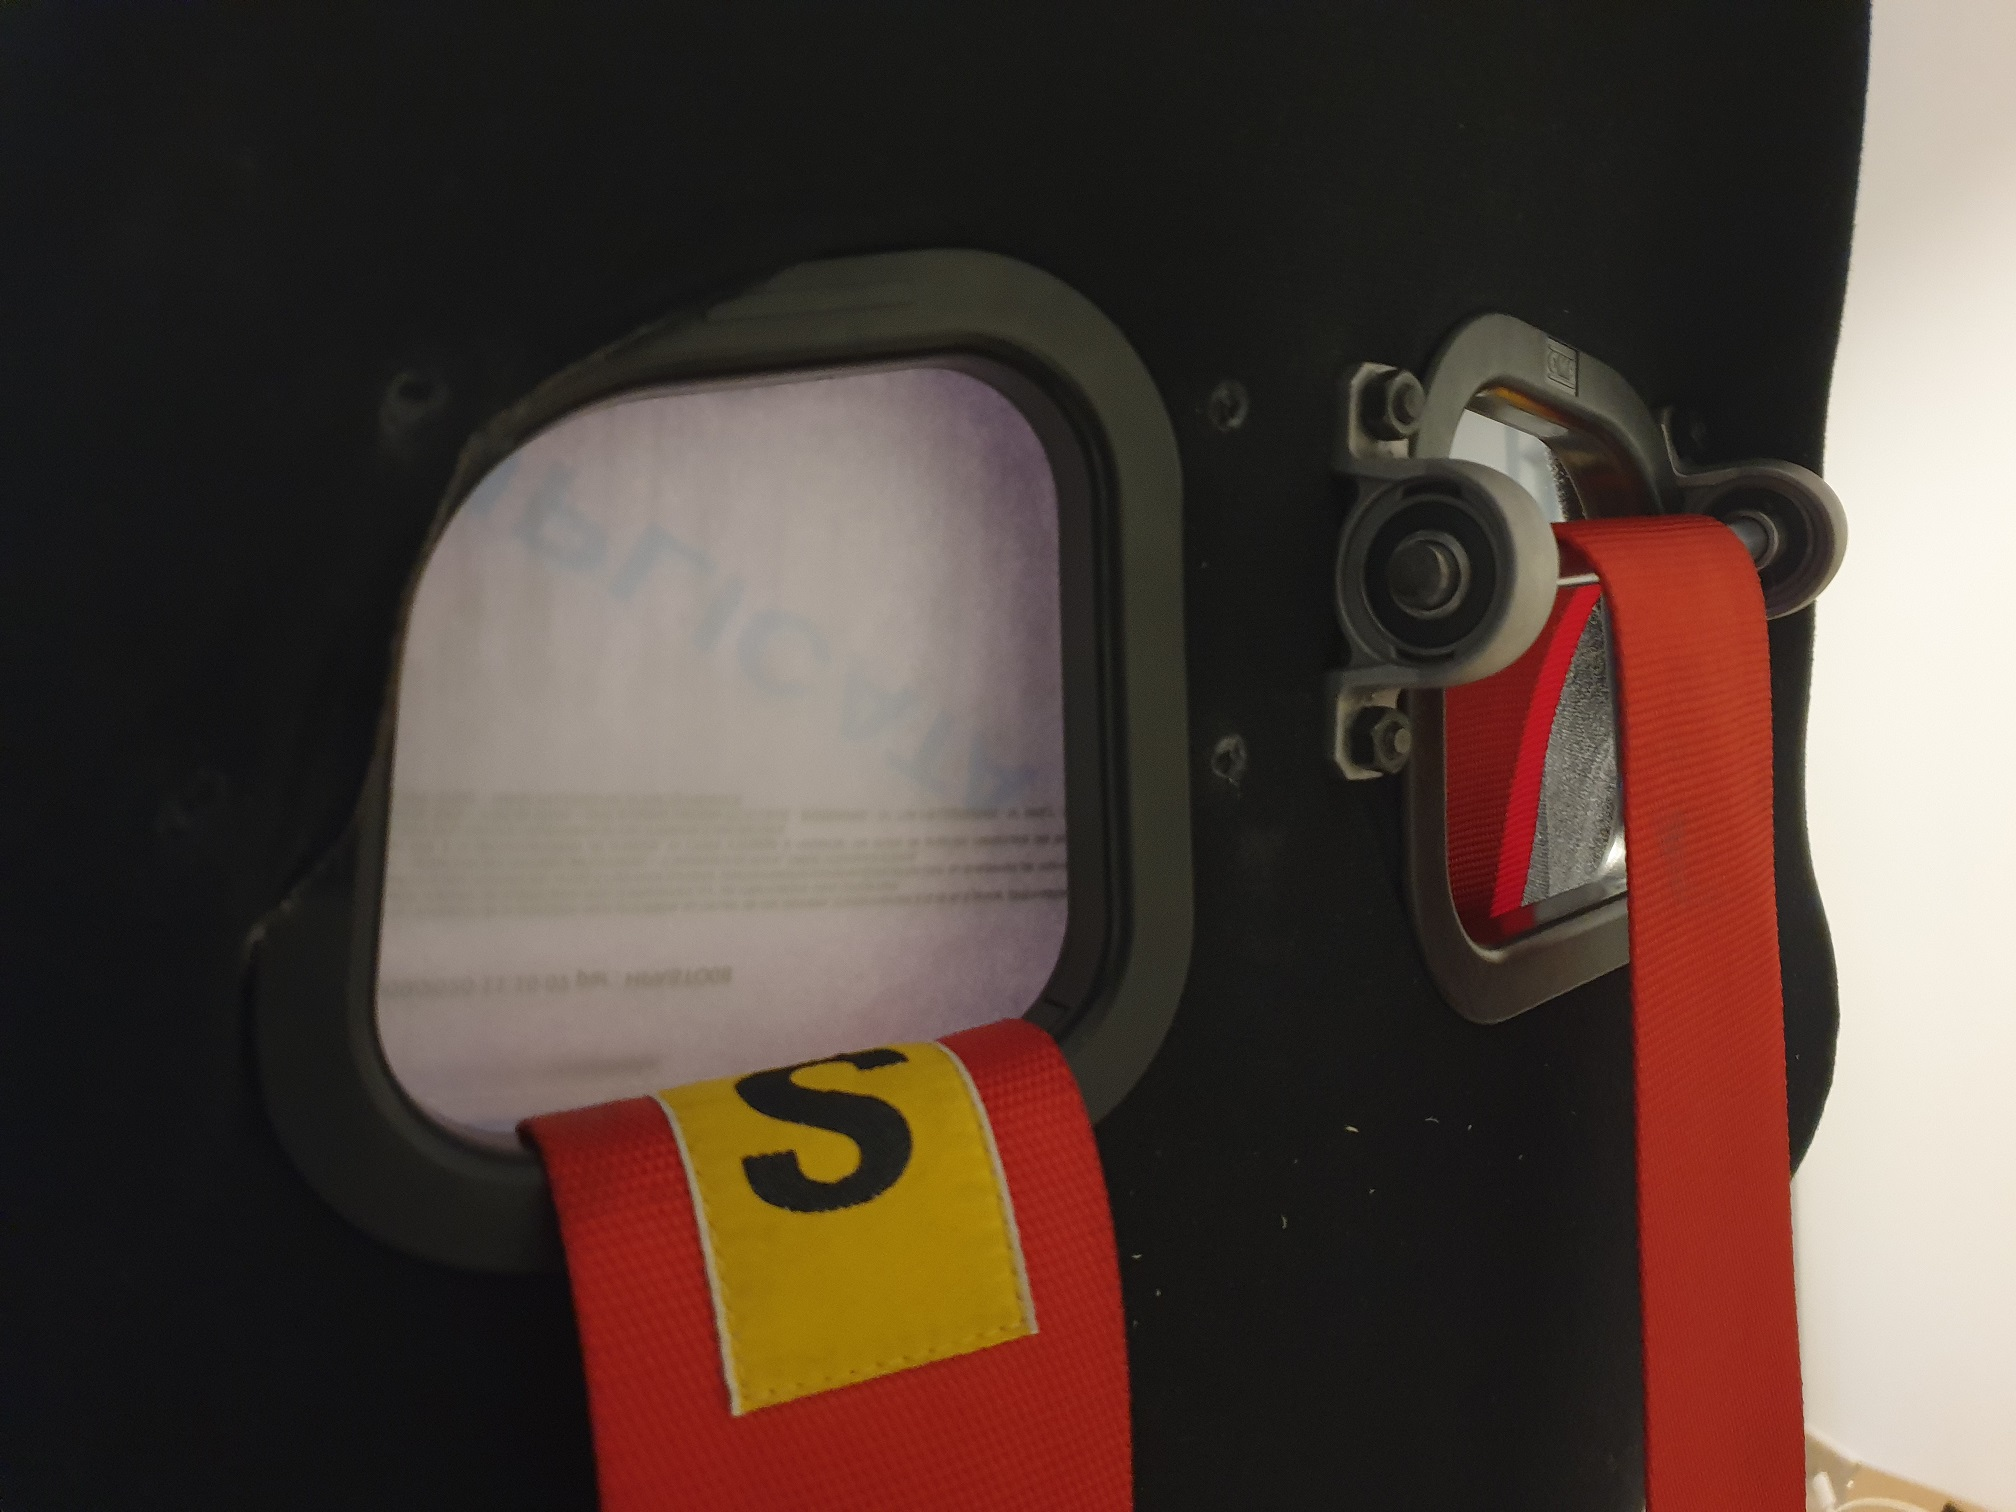 ball-bearing-harness-1-jpg.439582